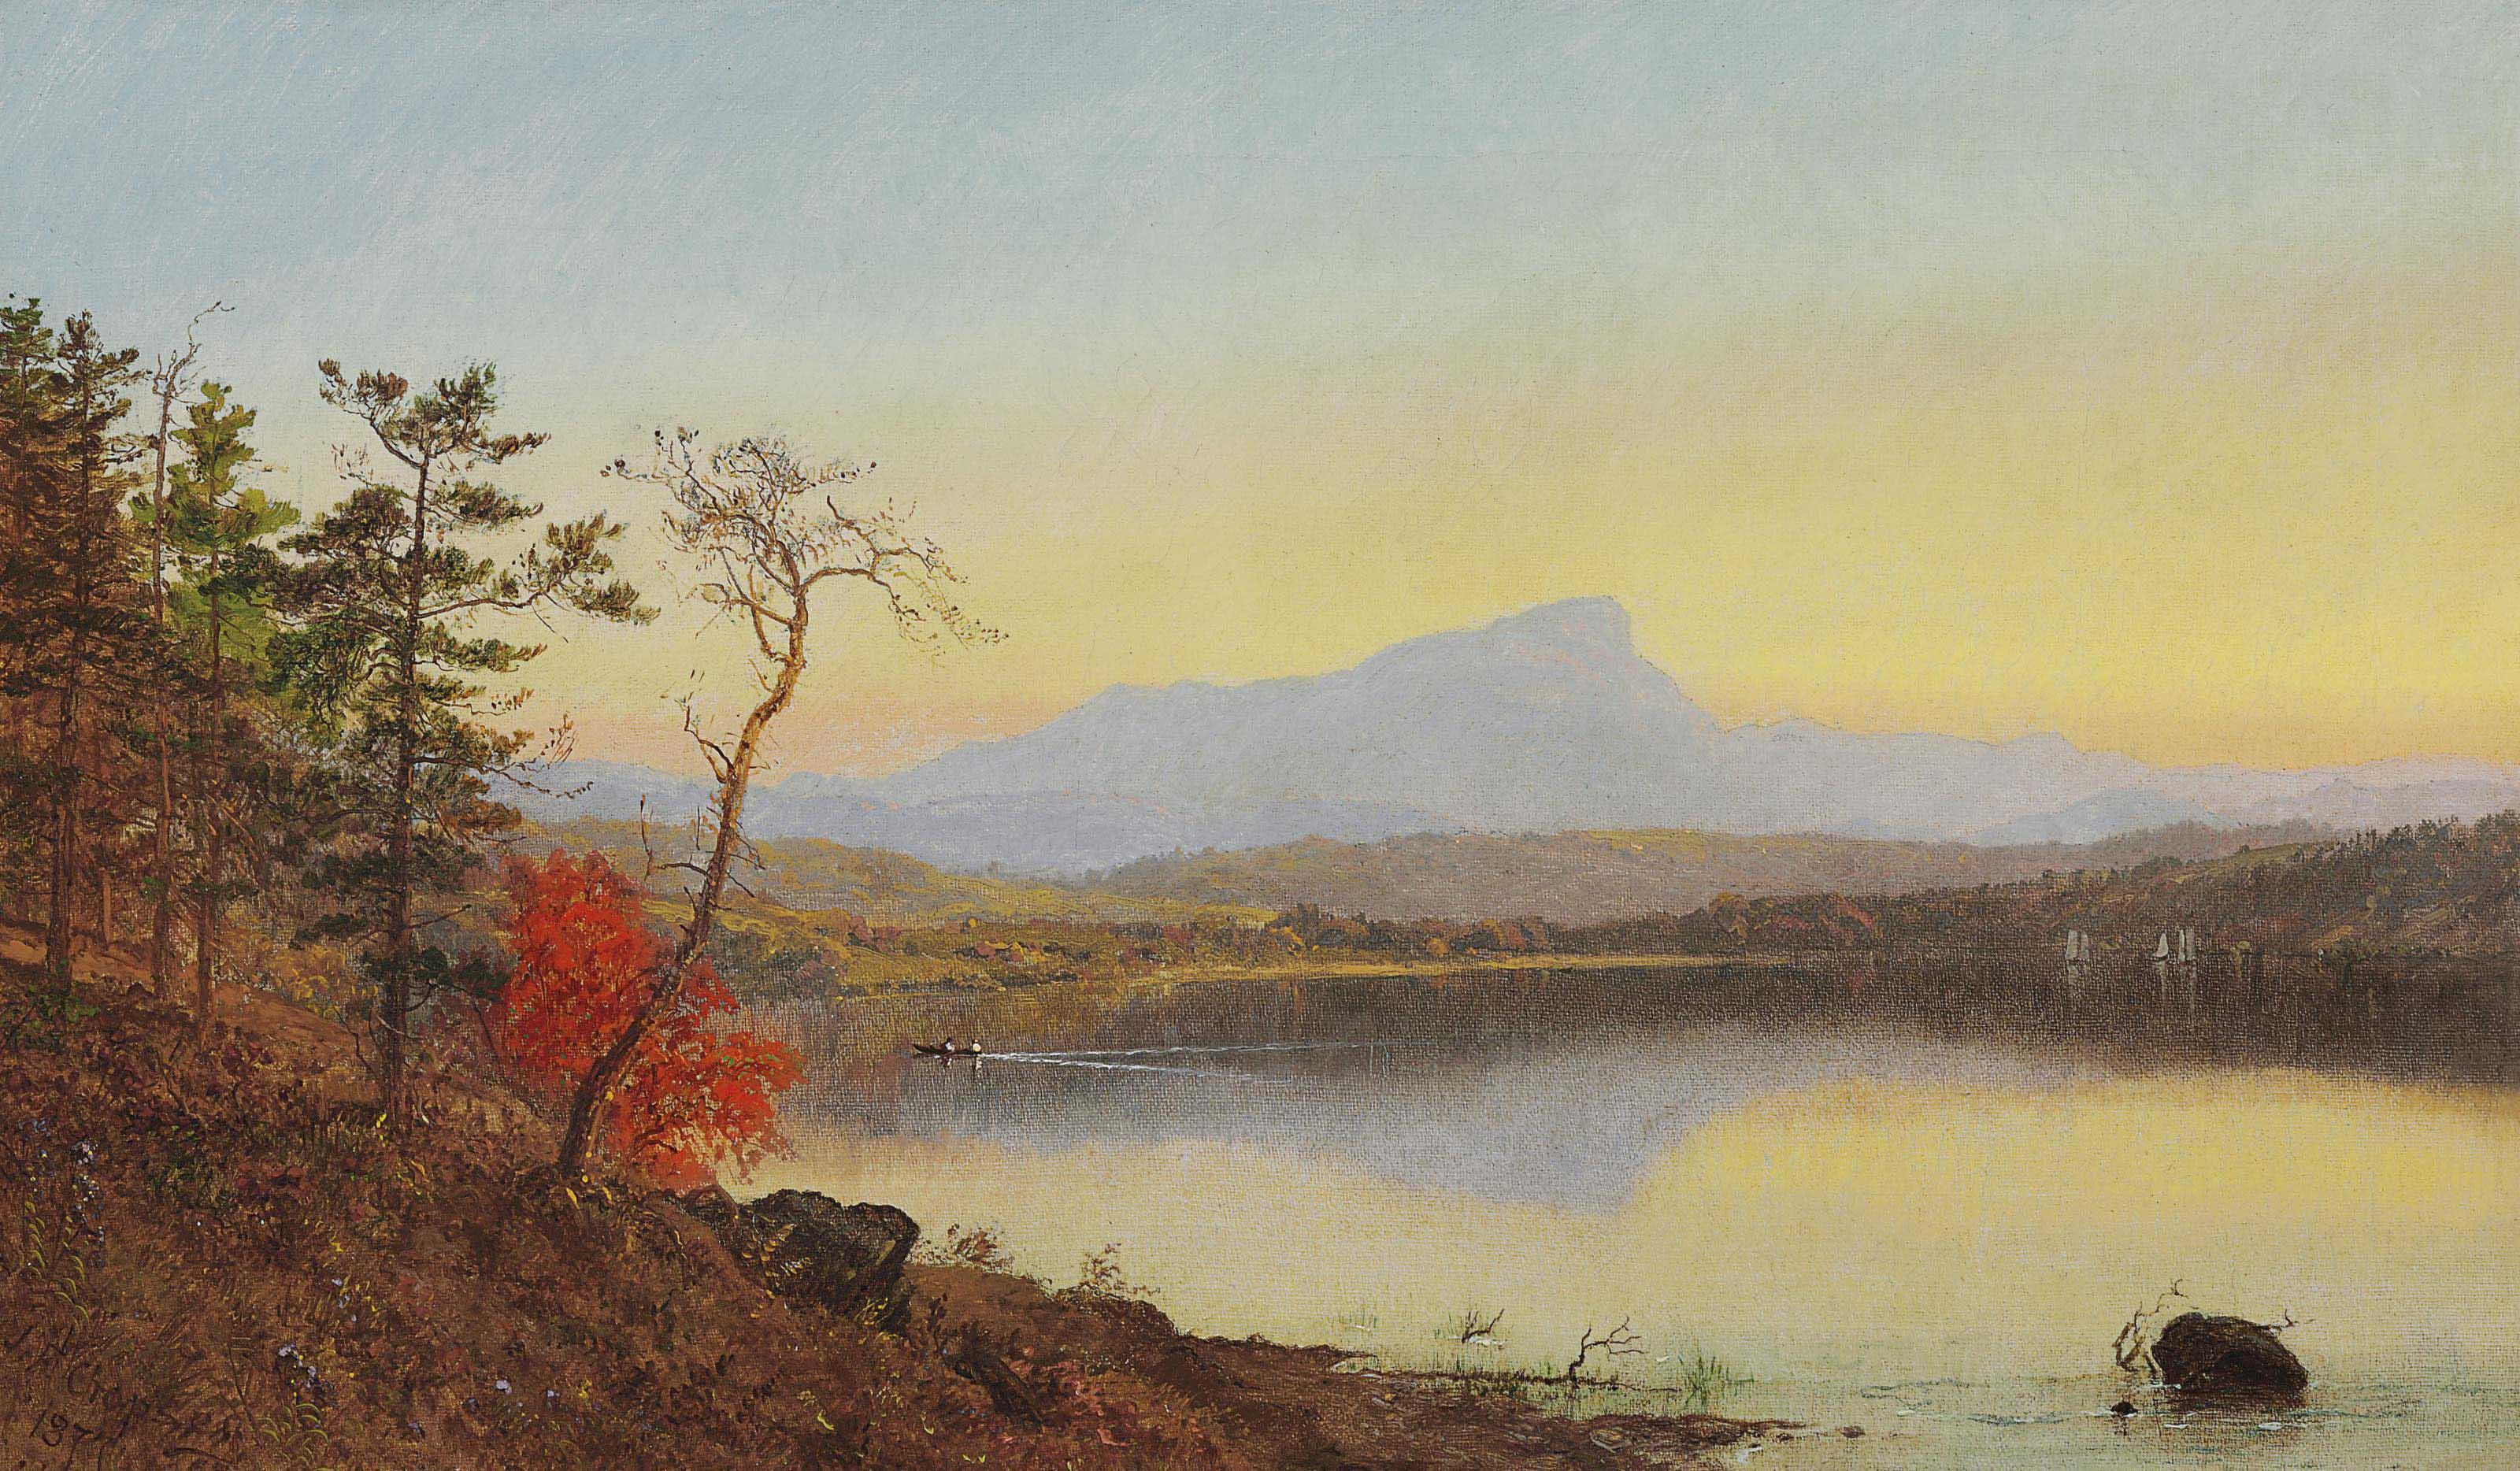 Sunset, Camel's Hump, Lake Champlain